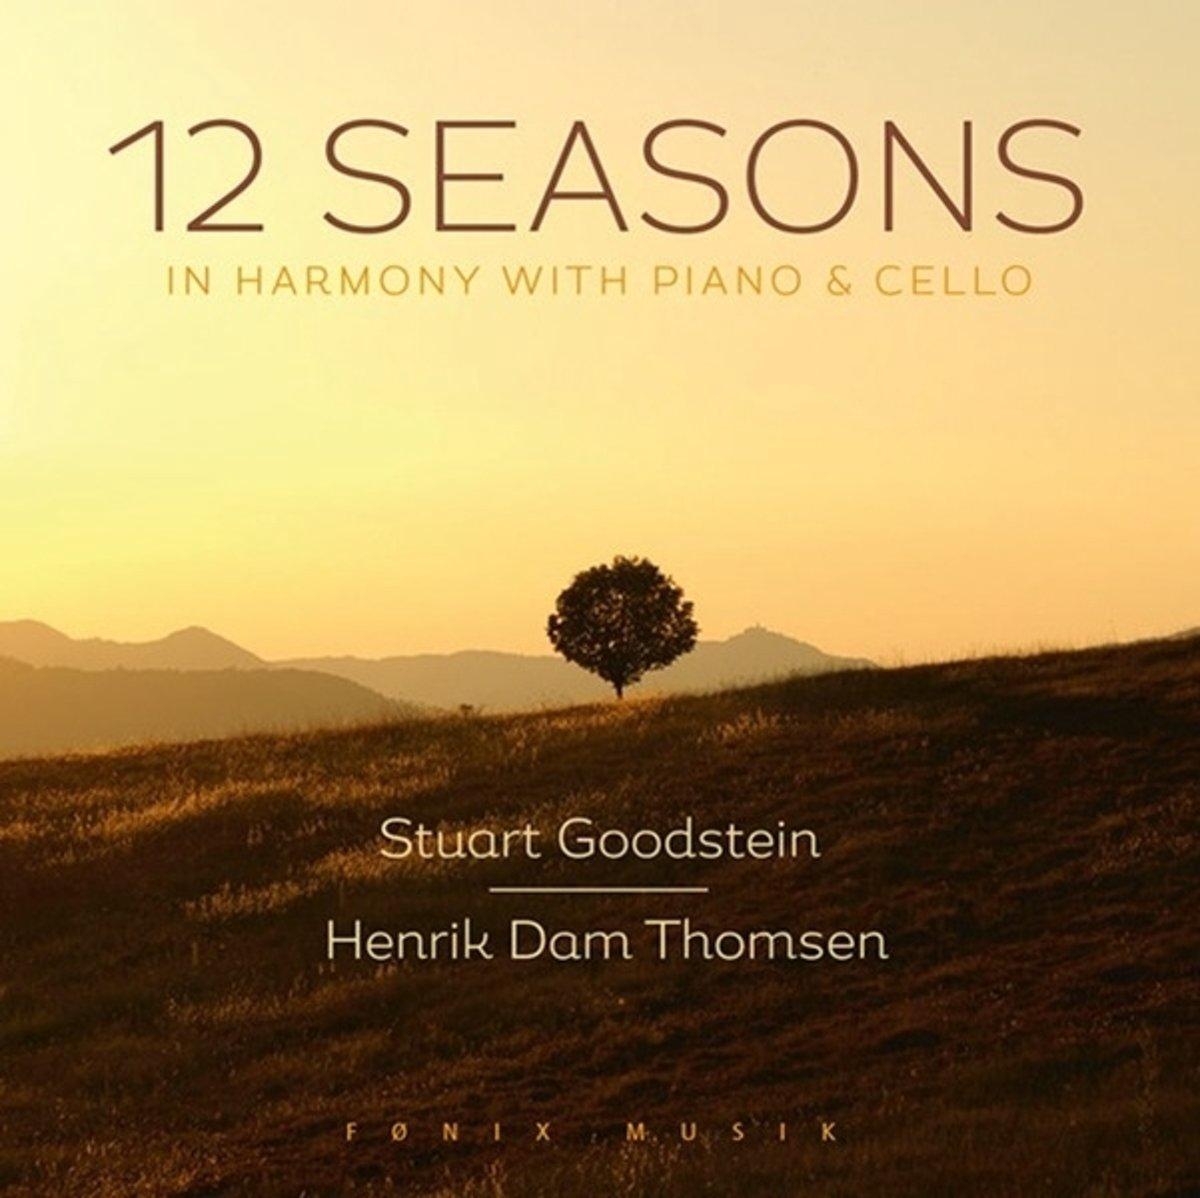 12 Seasons kopen